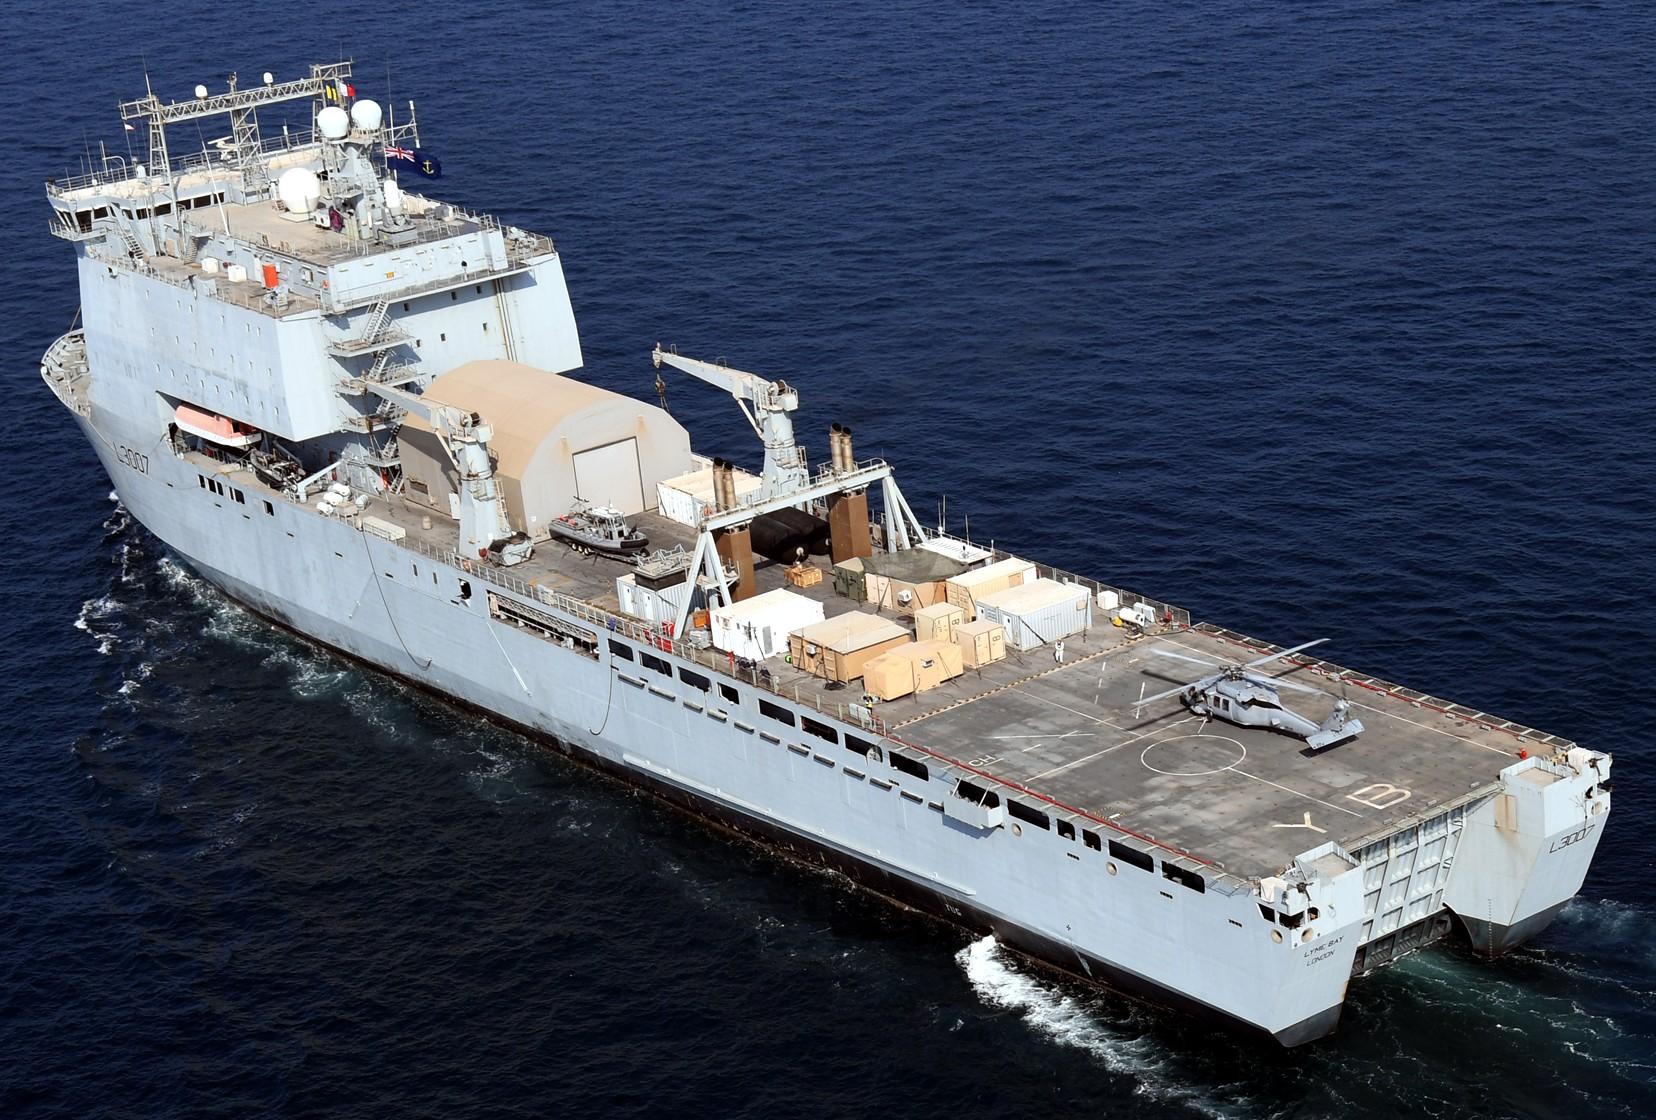 Rfa Lyme Bay Dock Landing Ship Lsd Amphibious Royal